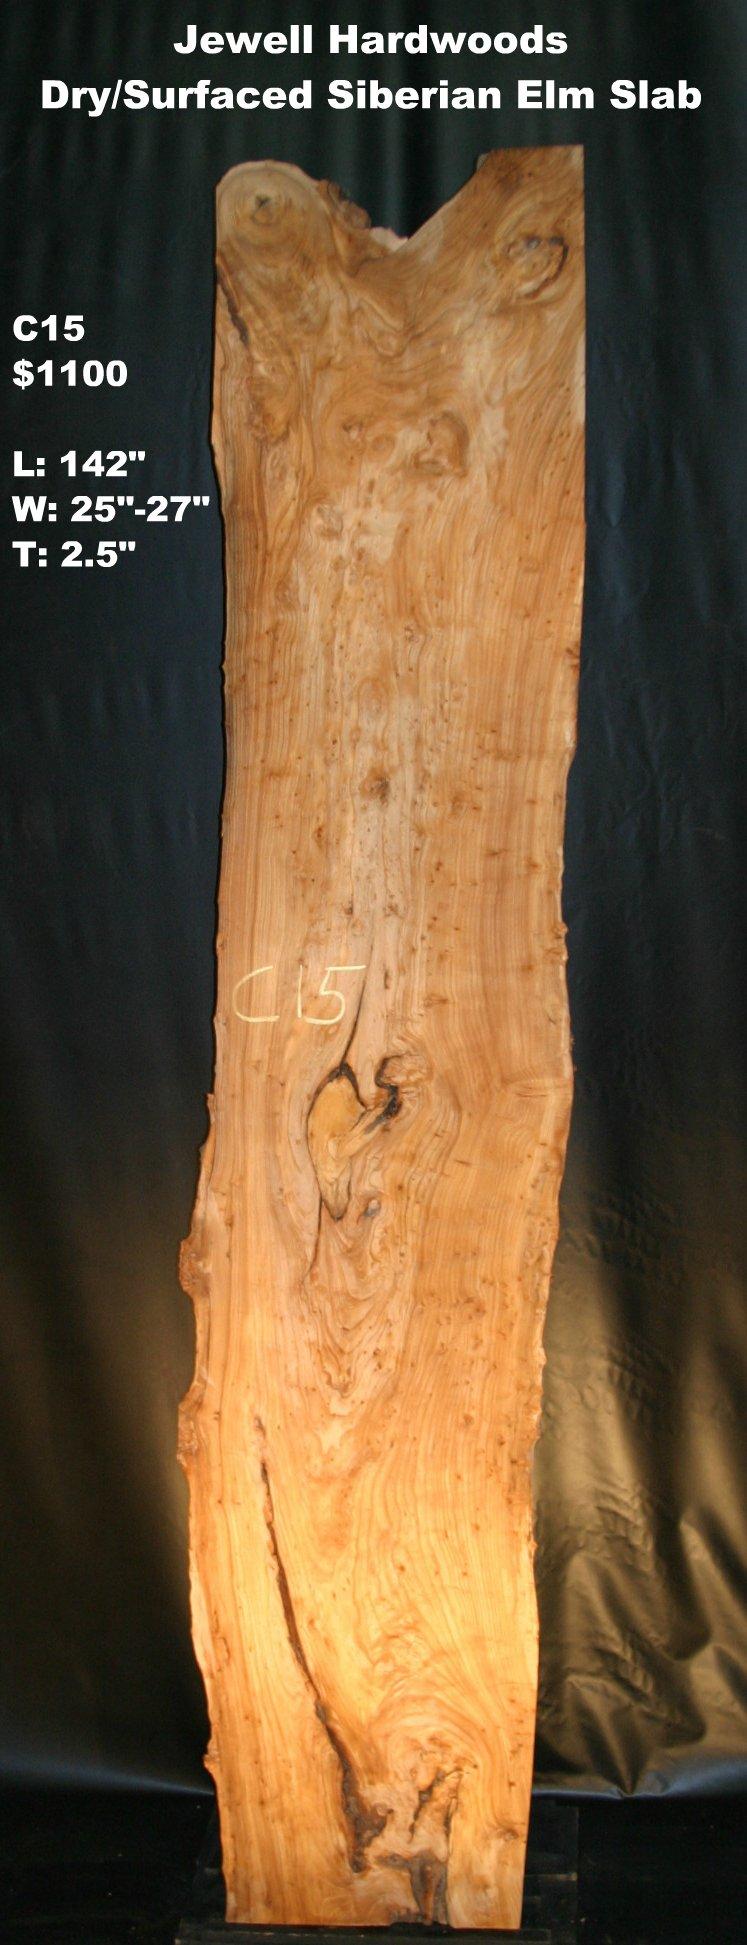 Jewell Hardwoods Products High Quality Hardwood Slabs